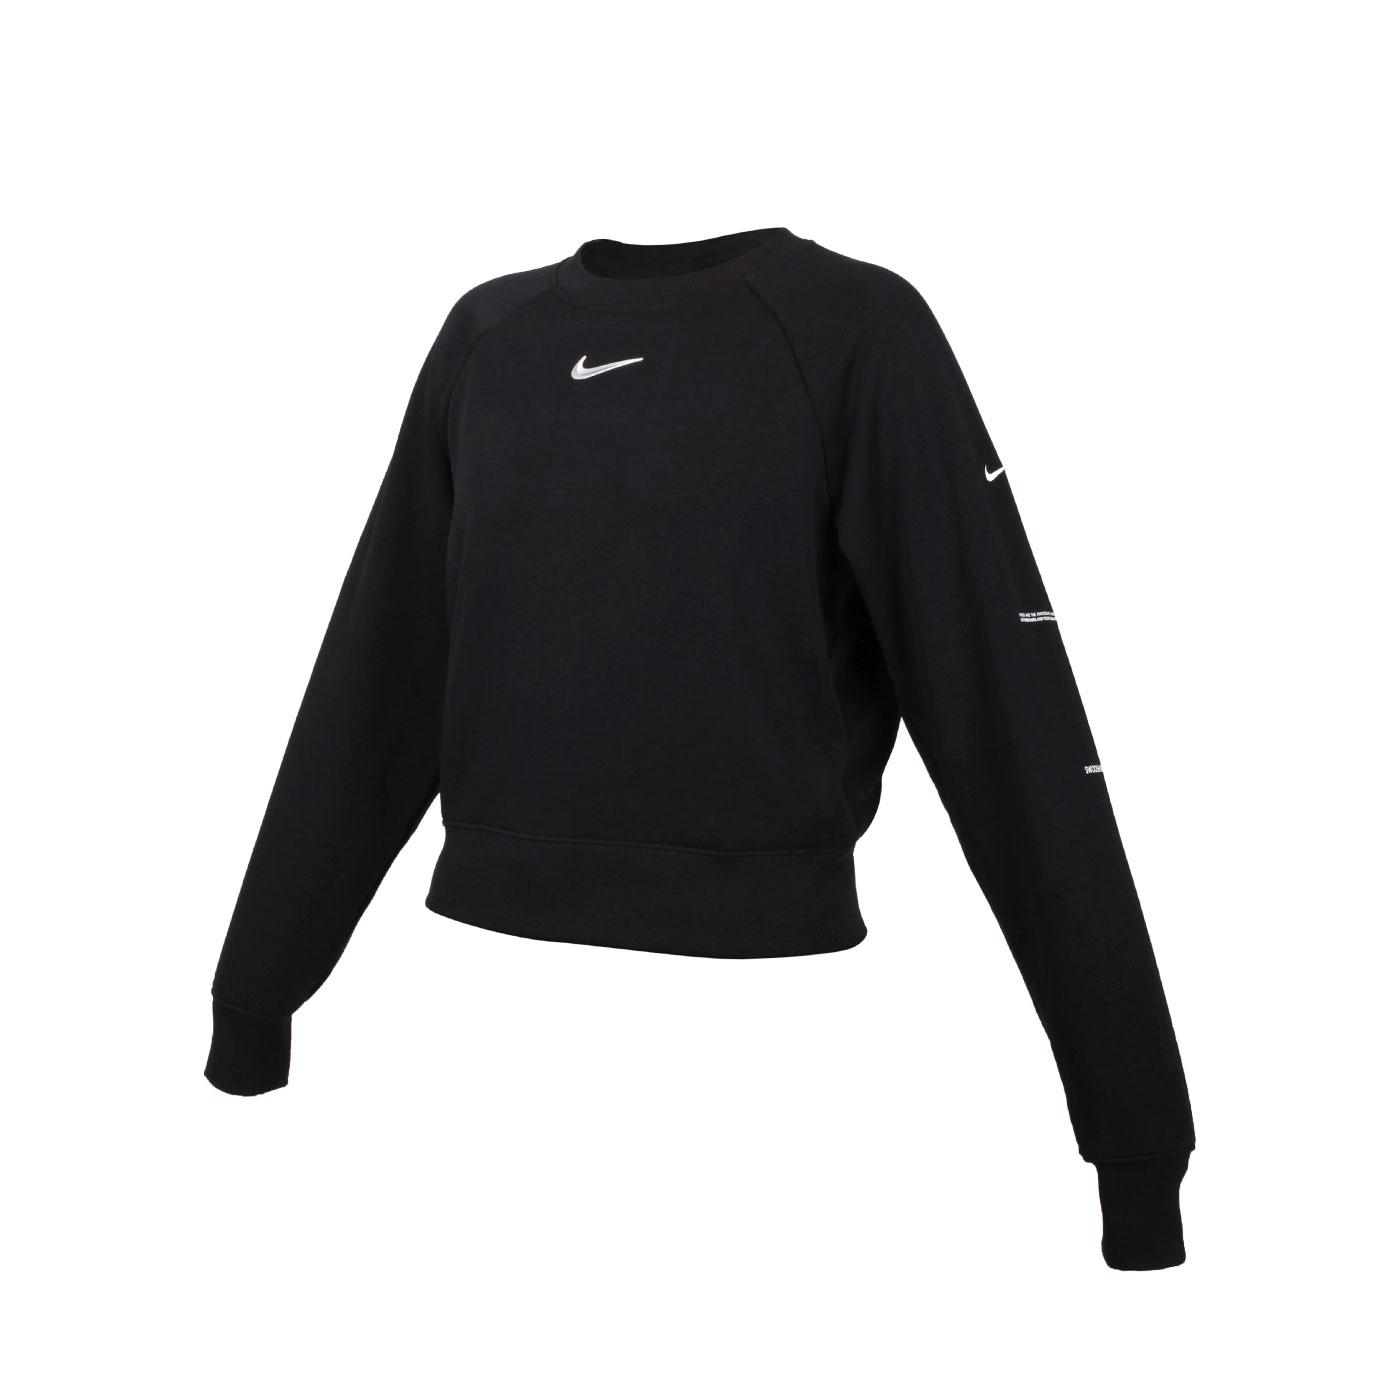 NIKE 女款圓領長袖T恤 CZ8891-010 - 黑銀